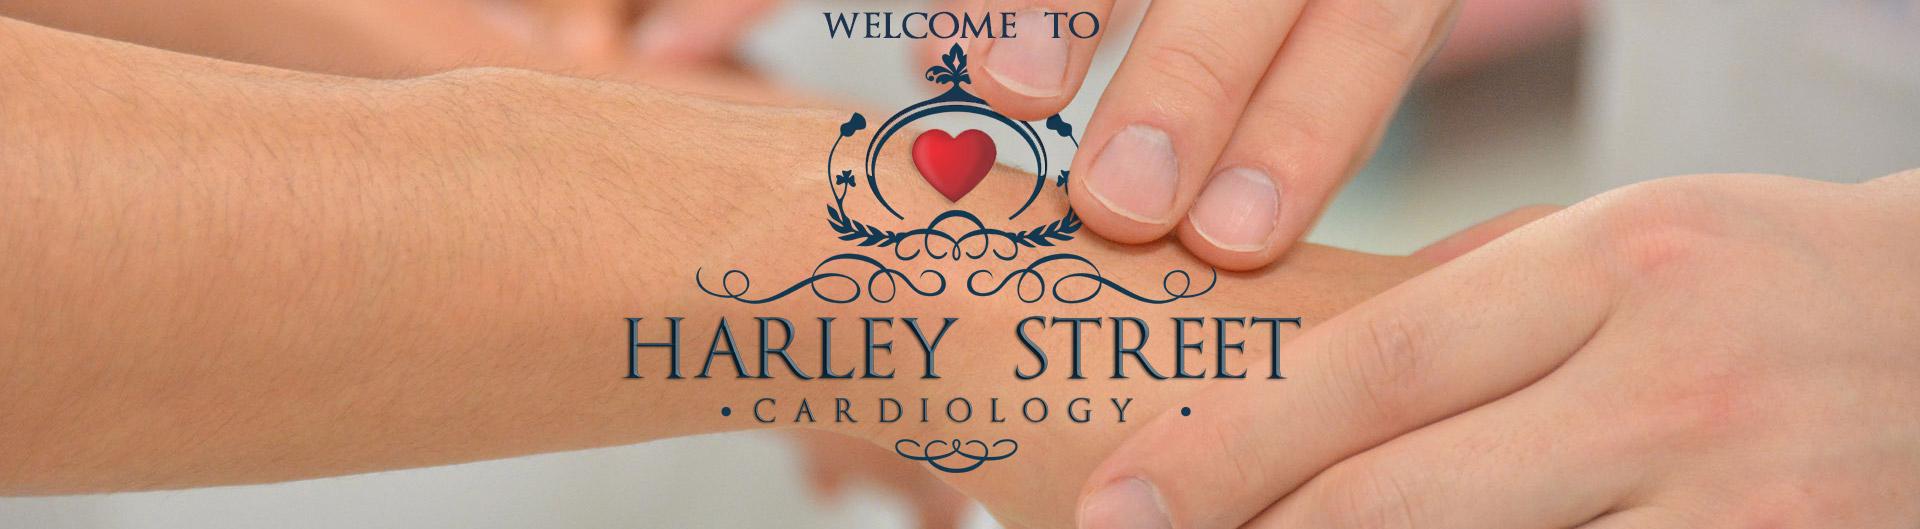 Harley Street Cardiology taking pulse header